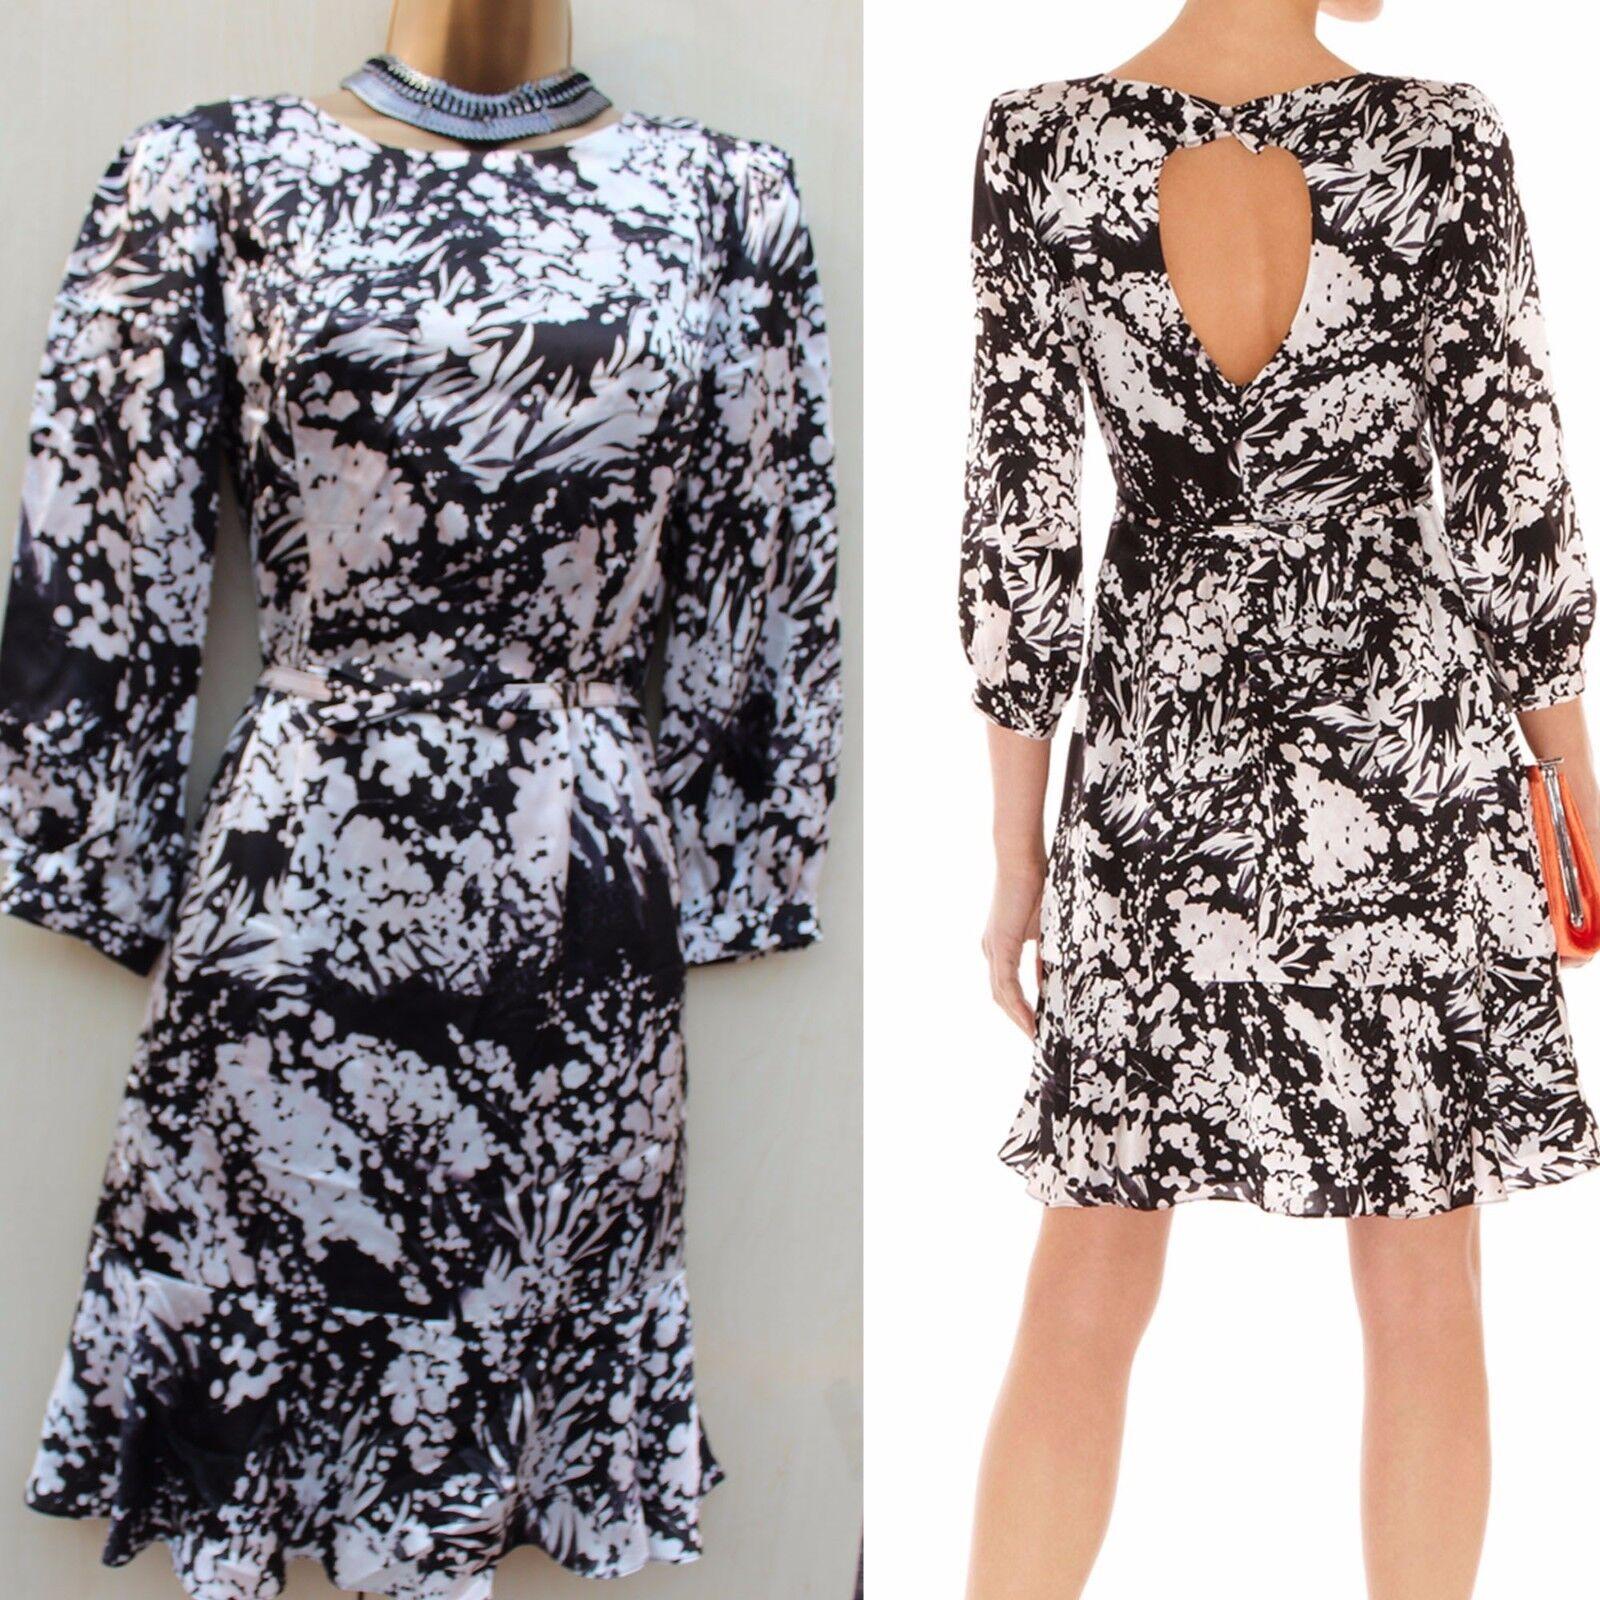 KAREN MILLEN schwarz Ivory Soft Silk Bow Keyhole Floral Flare Summer Dress SZ-10